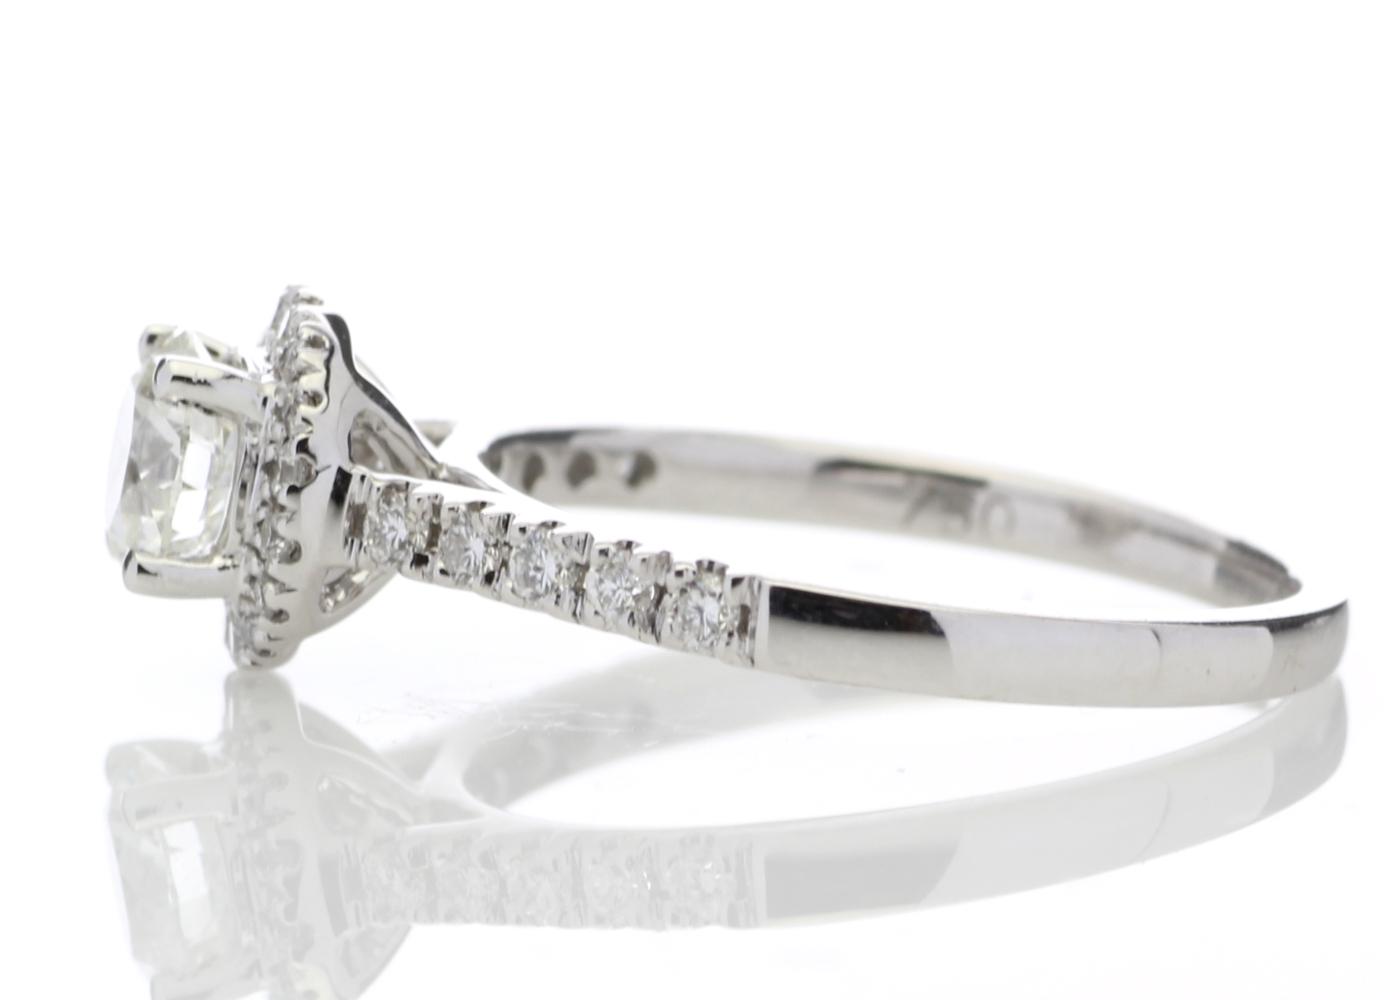 Lot 23 - 18ct White Gold Halo Diamond Ring 0.50 Carats